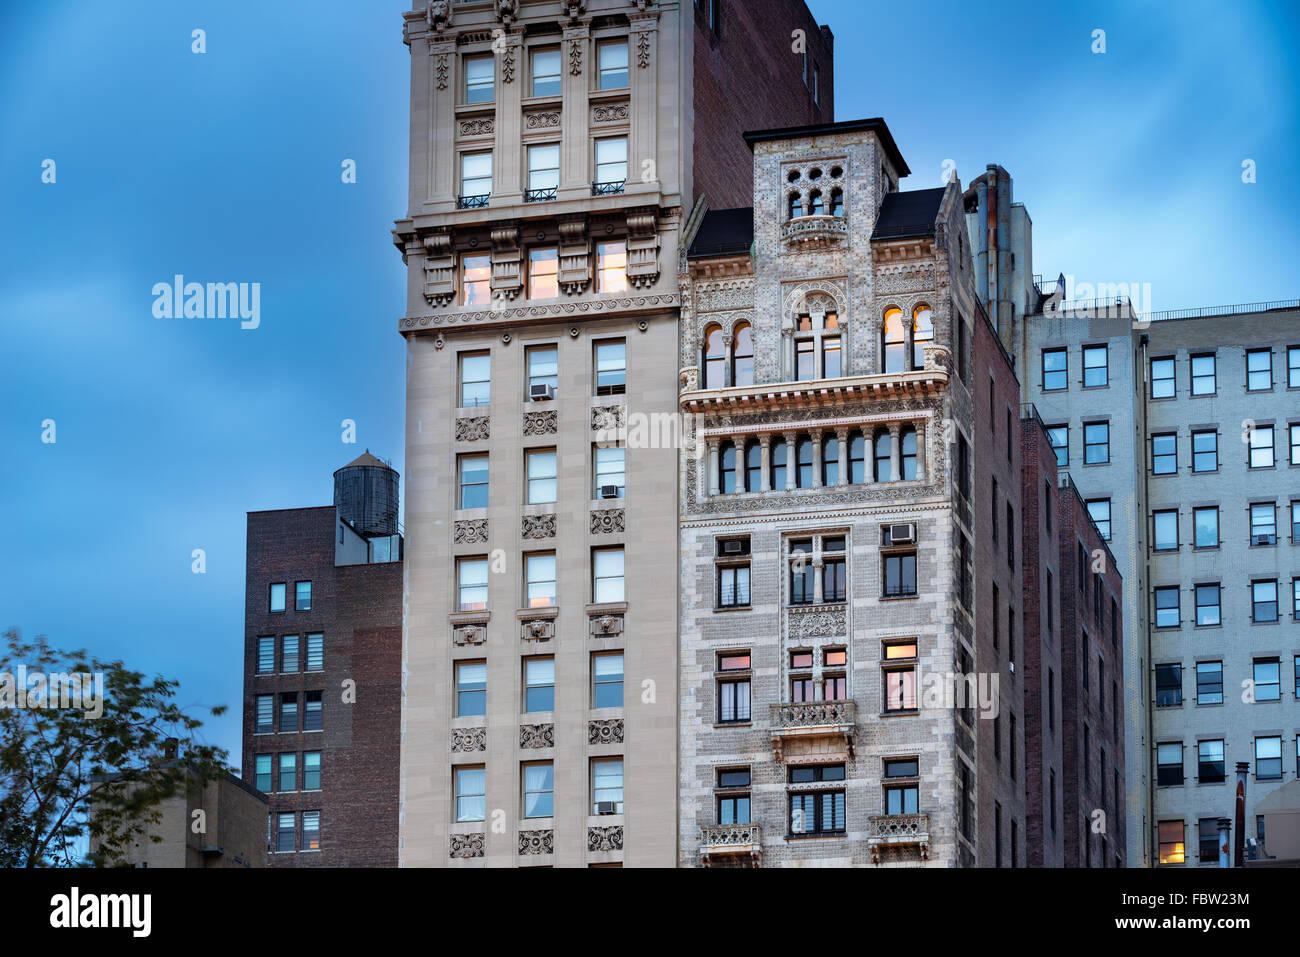 Banco del edificio Metrópolis y Decker edificio con su intrincada fachada de terracota, Union Square, Manhattan, Imagen De Stock